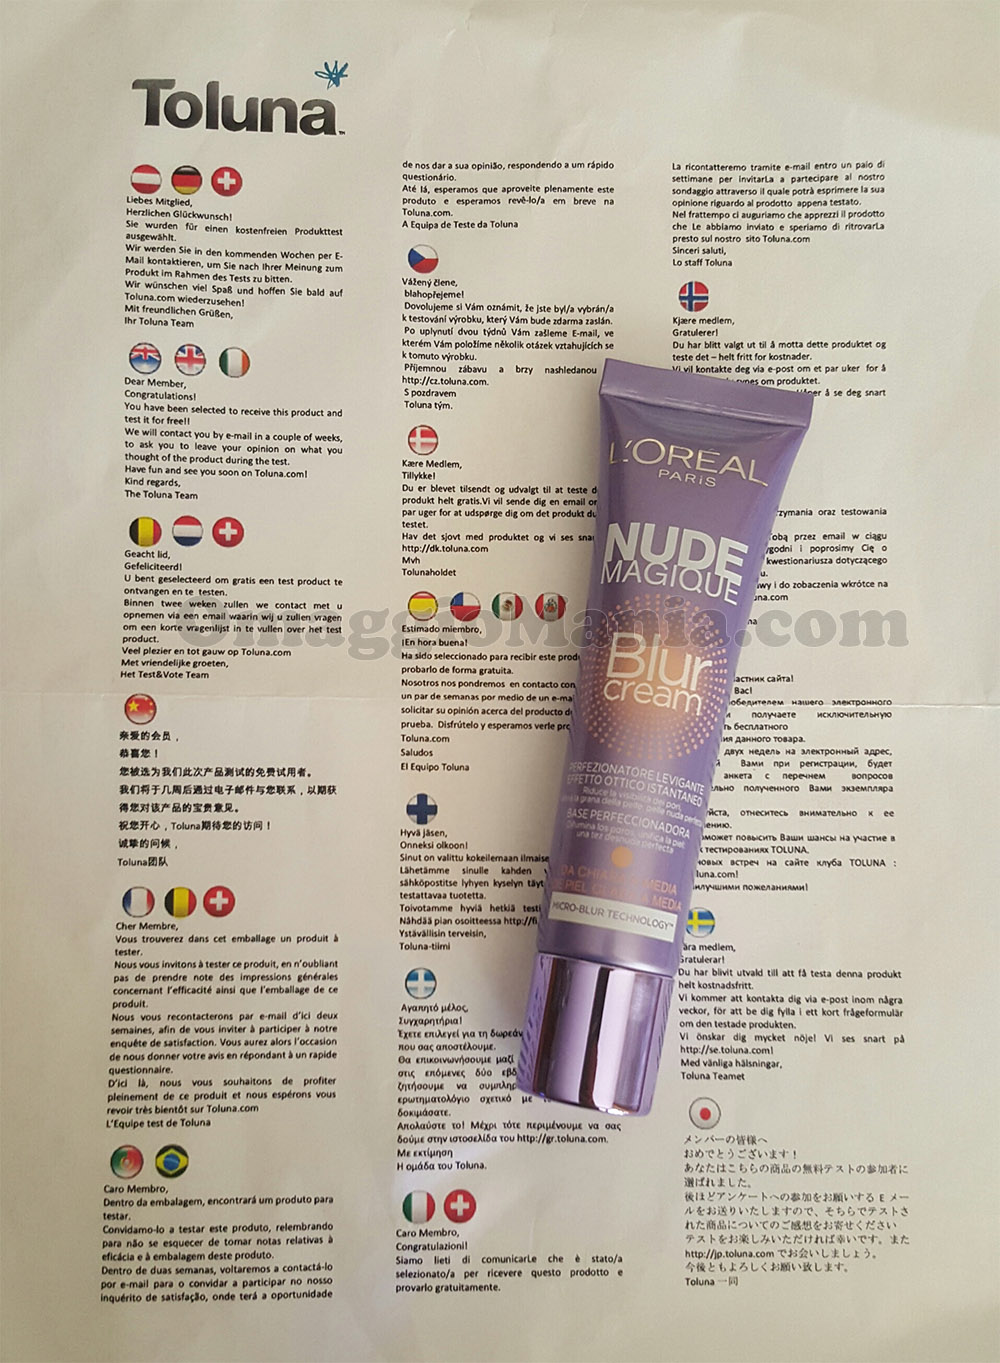 L'Oréal Nude Magique Blur Cream di Sole